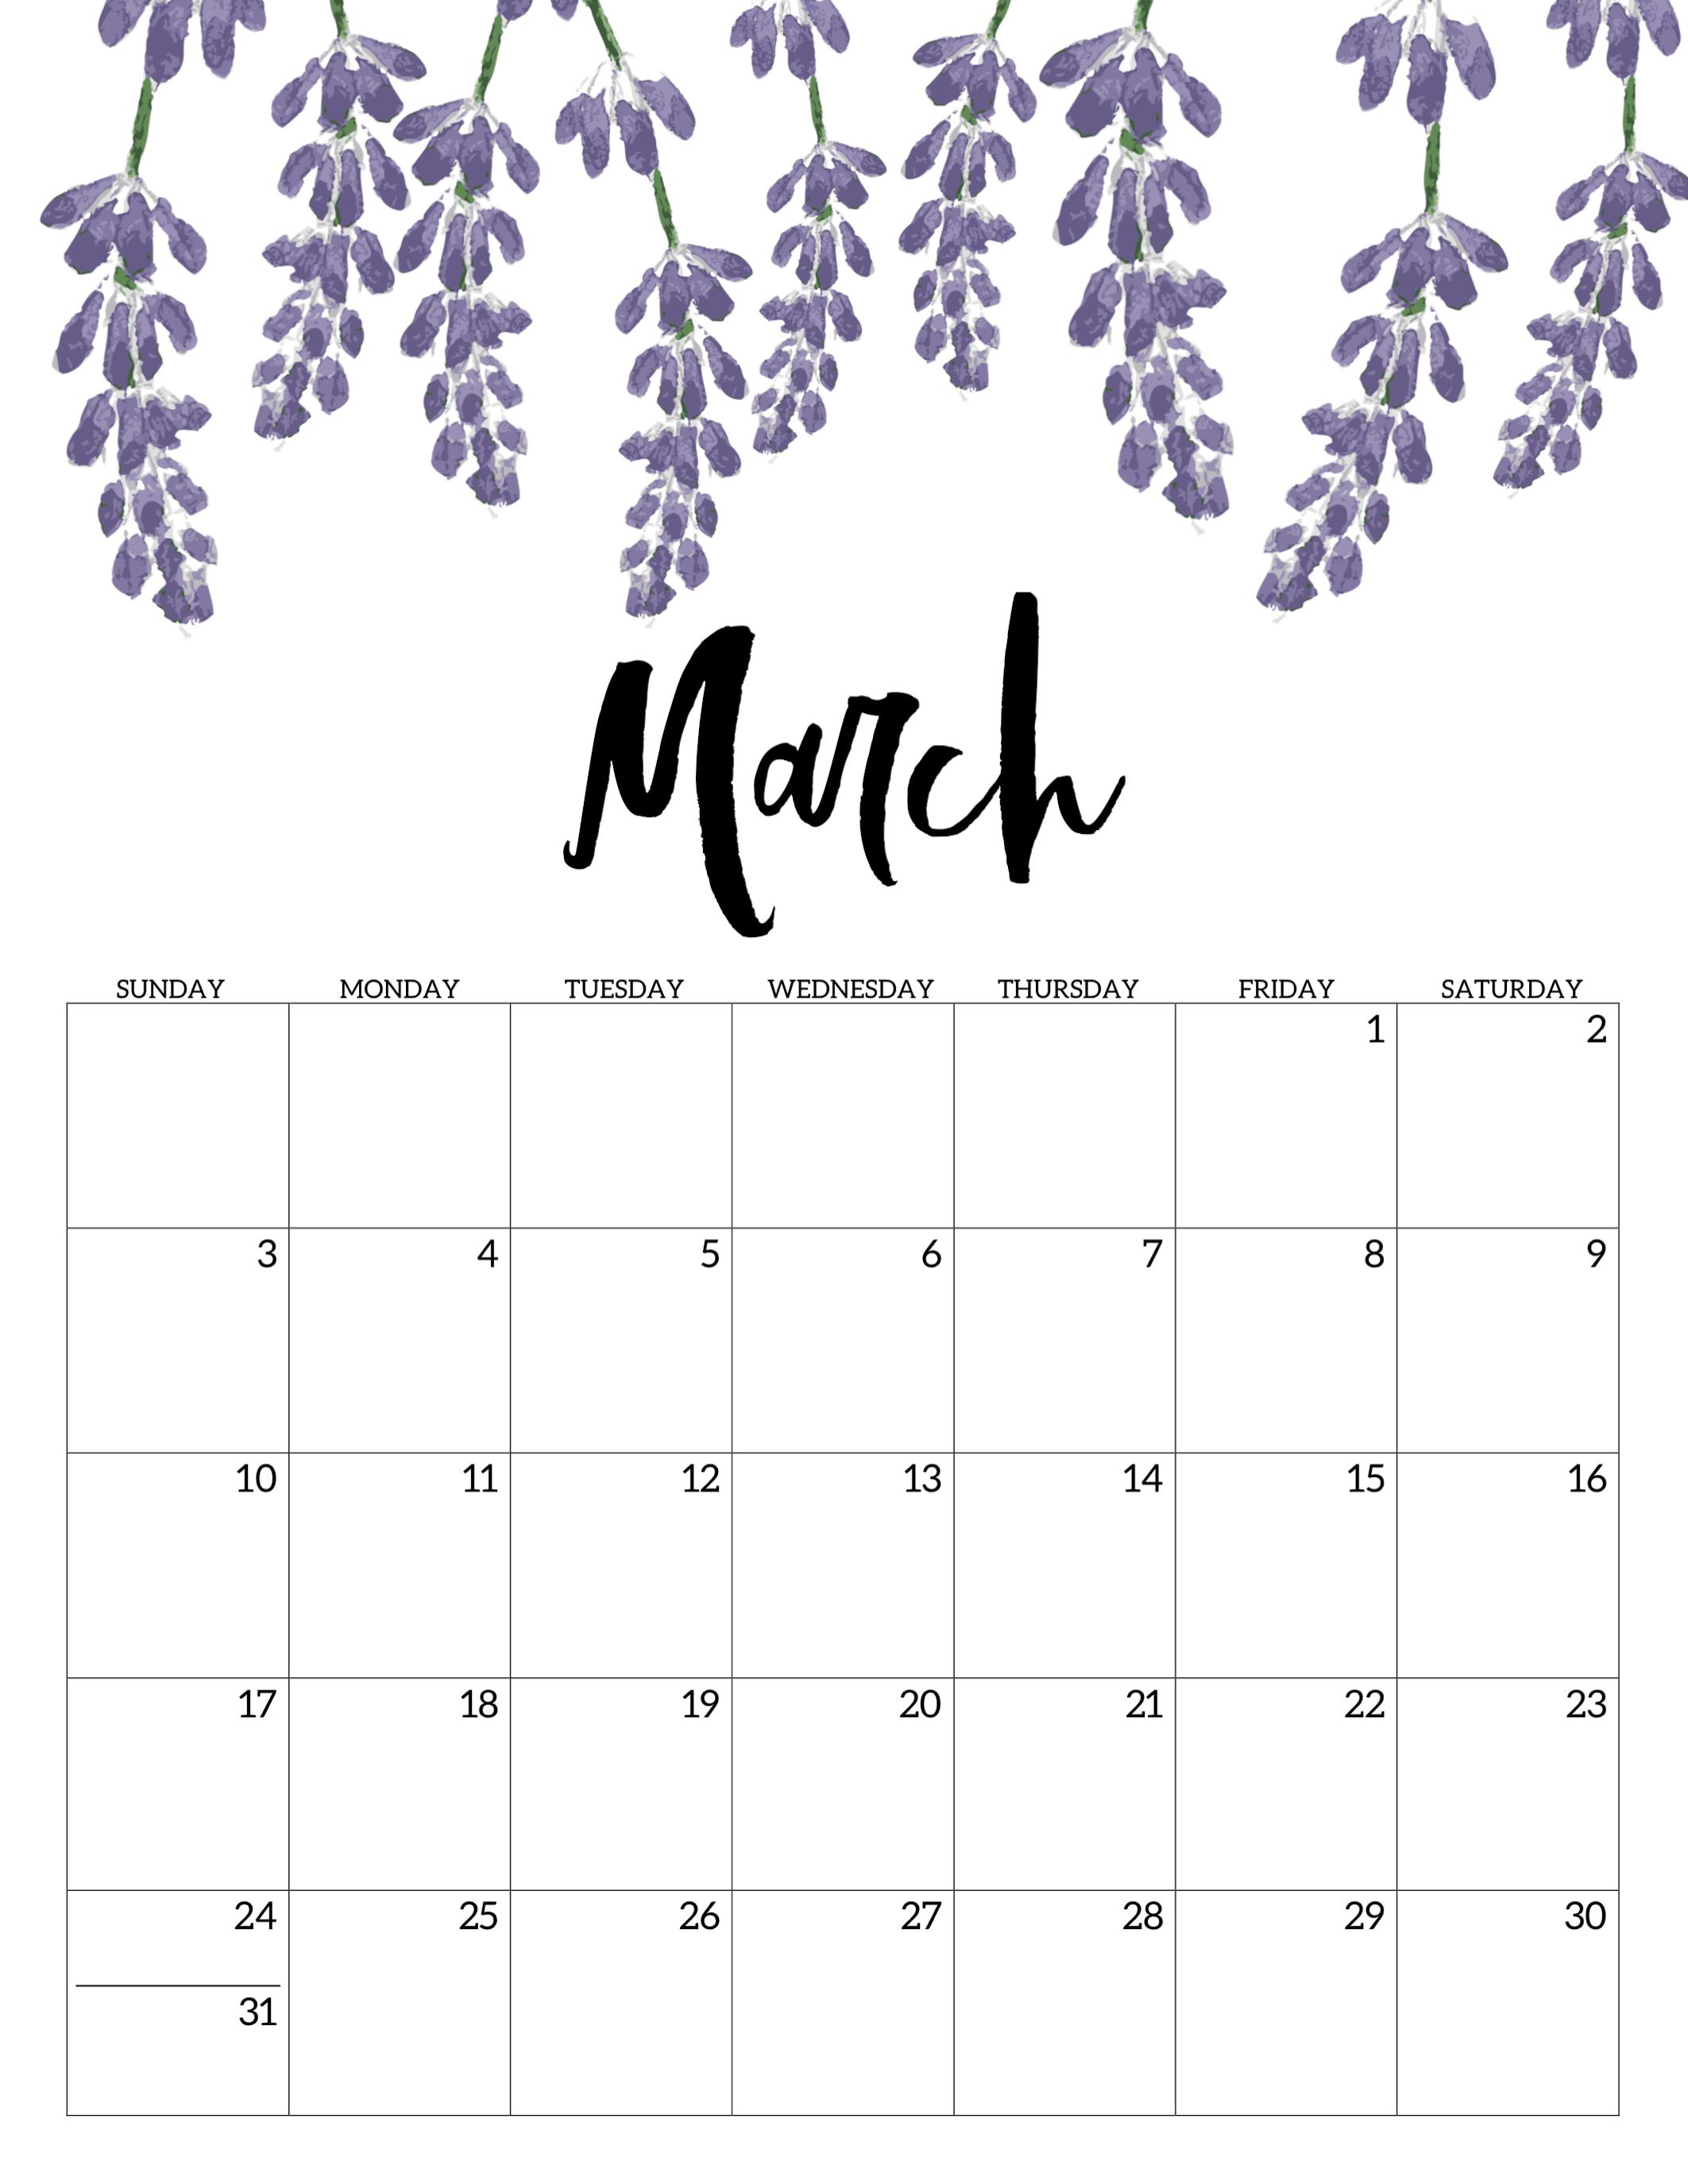 March 2019 Floral Desk Calendar